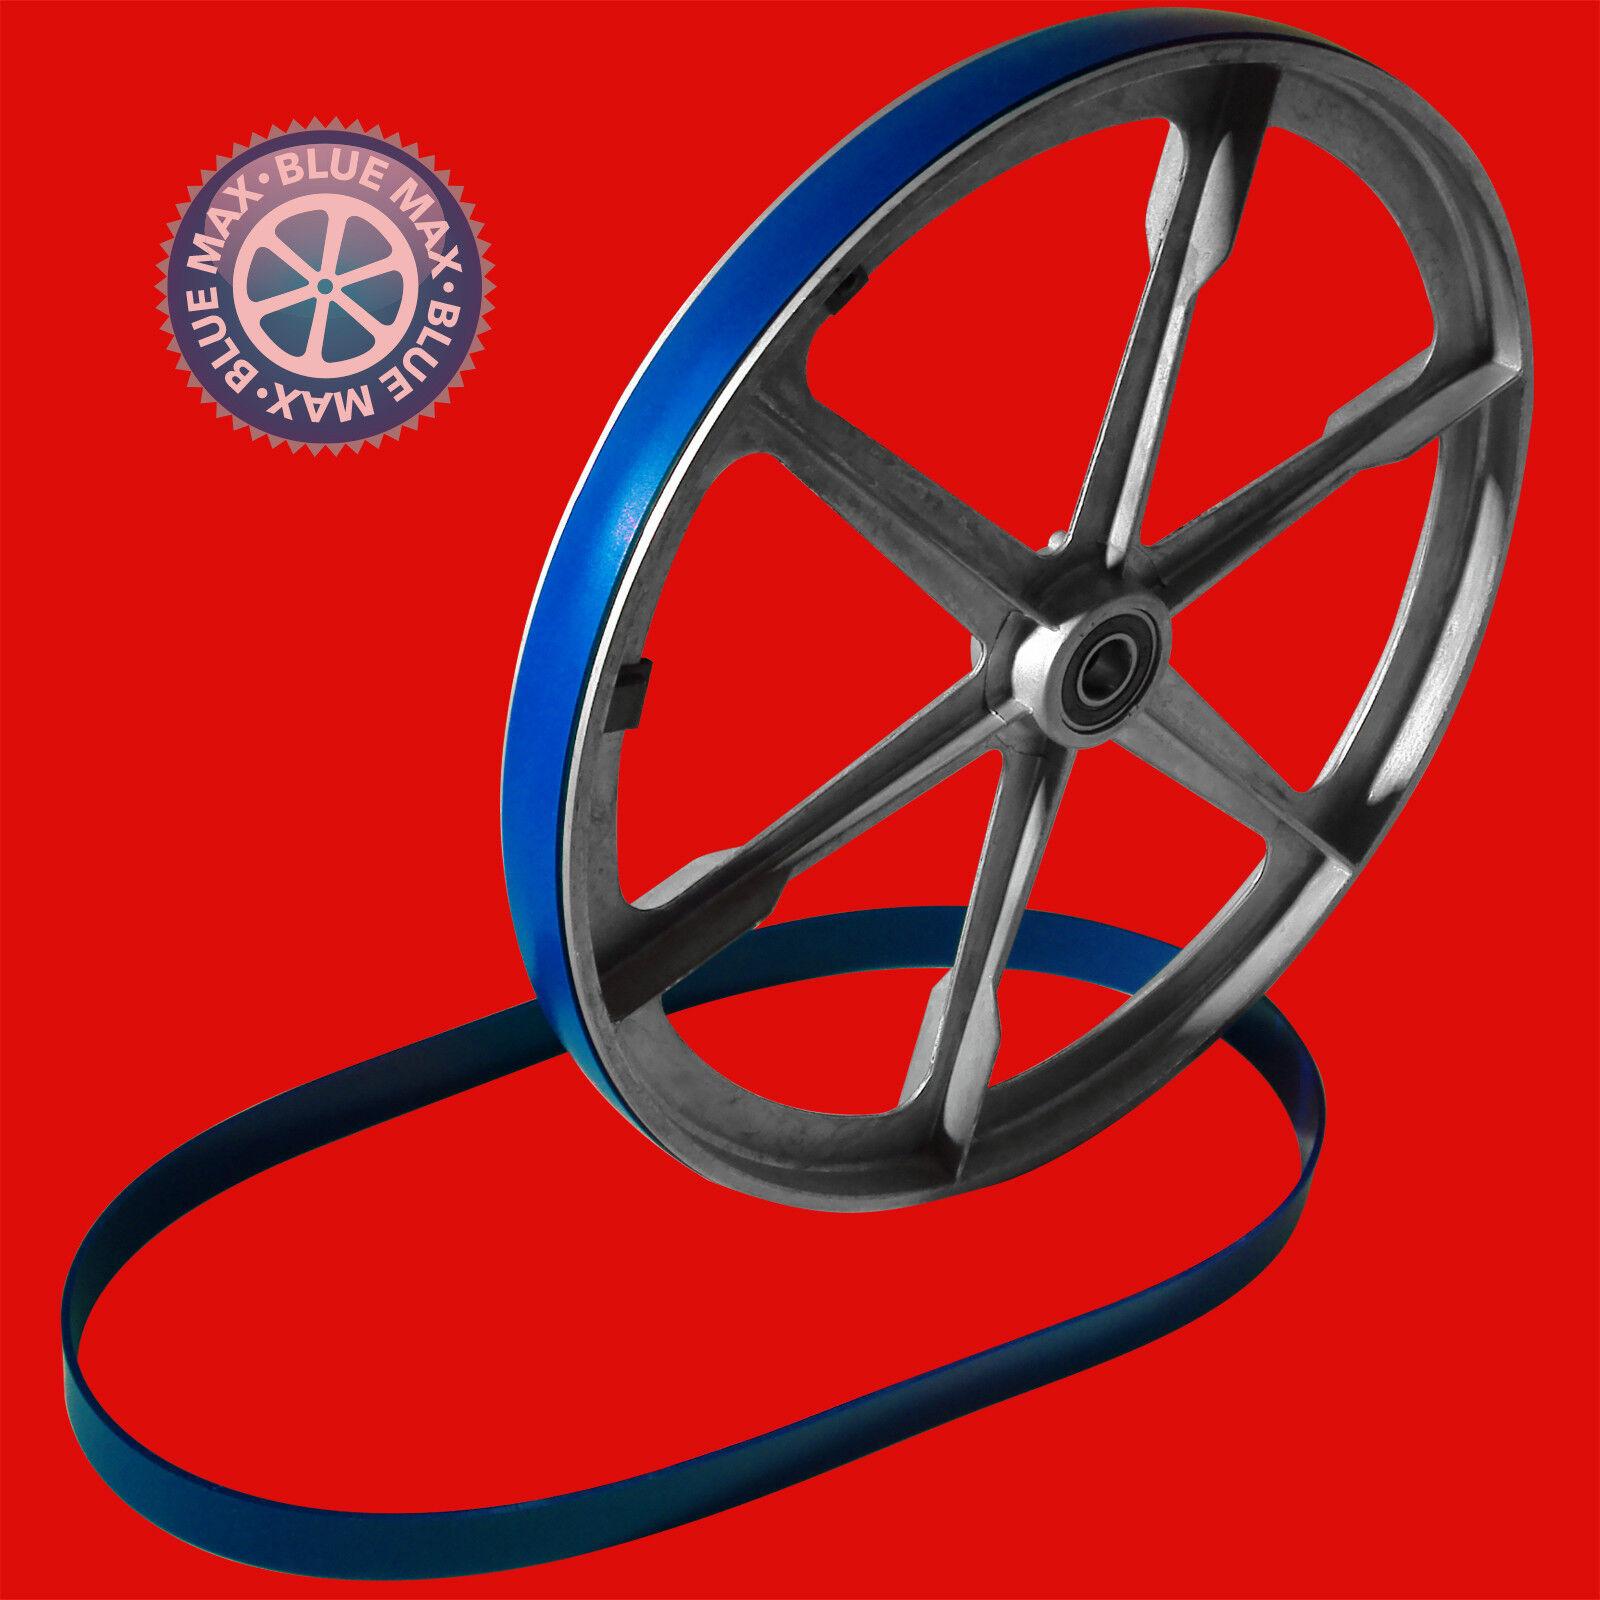 2 Blaues Max Ultra Duty Urethane Cinta Sierra Neumáticos de Puerto Freight 03179